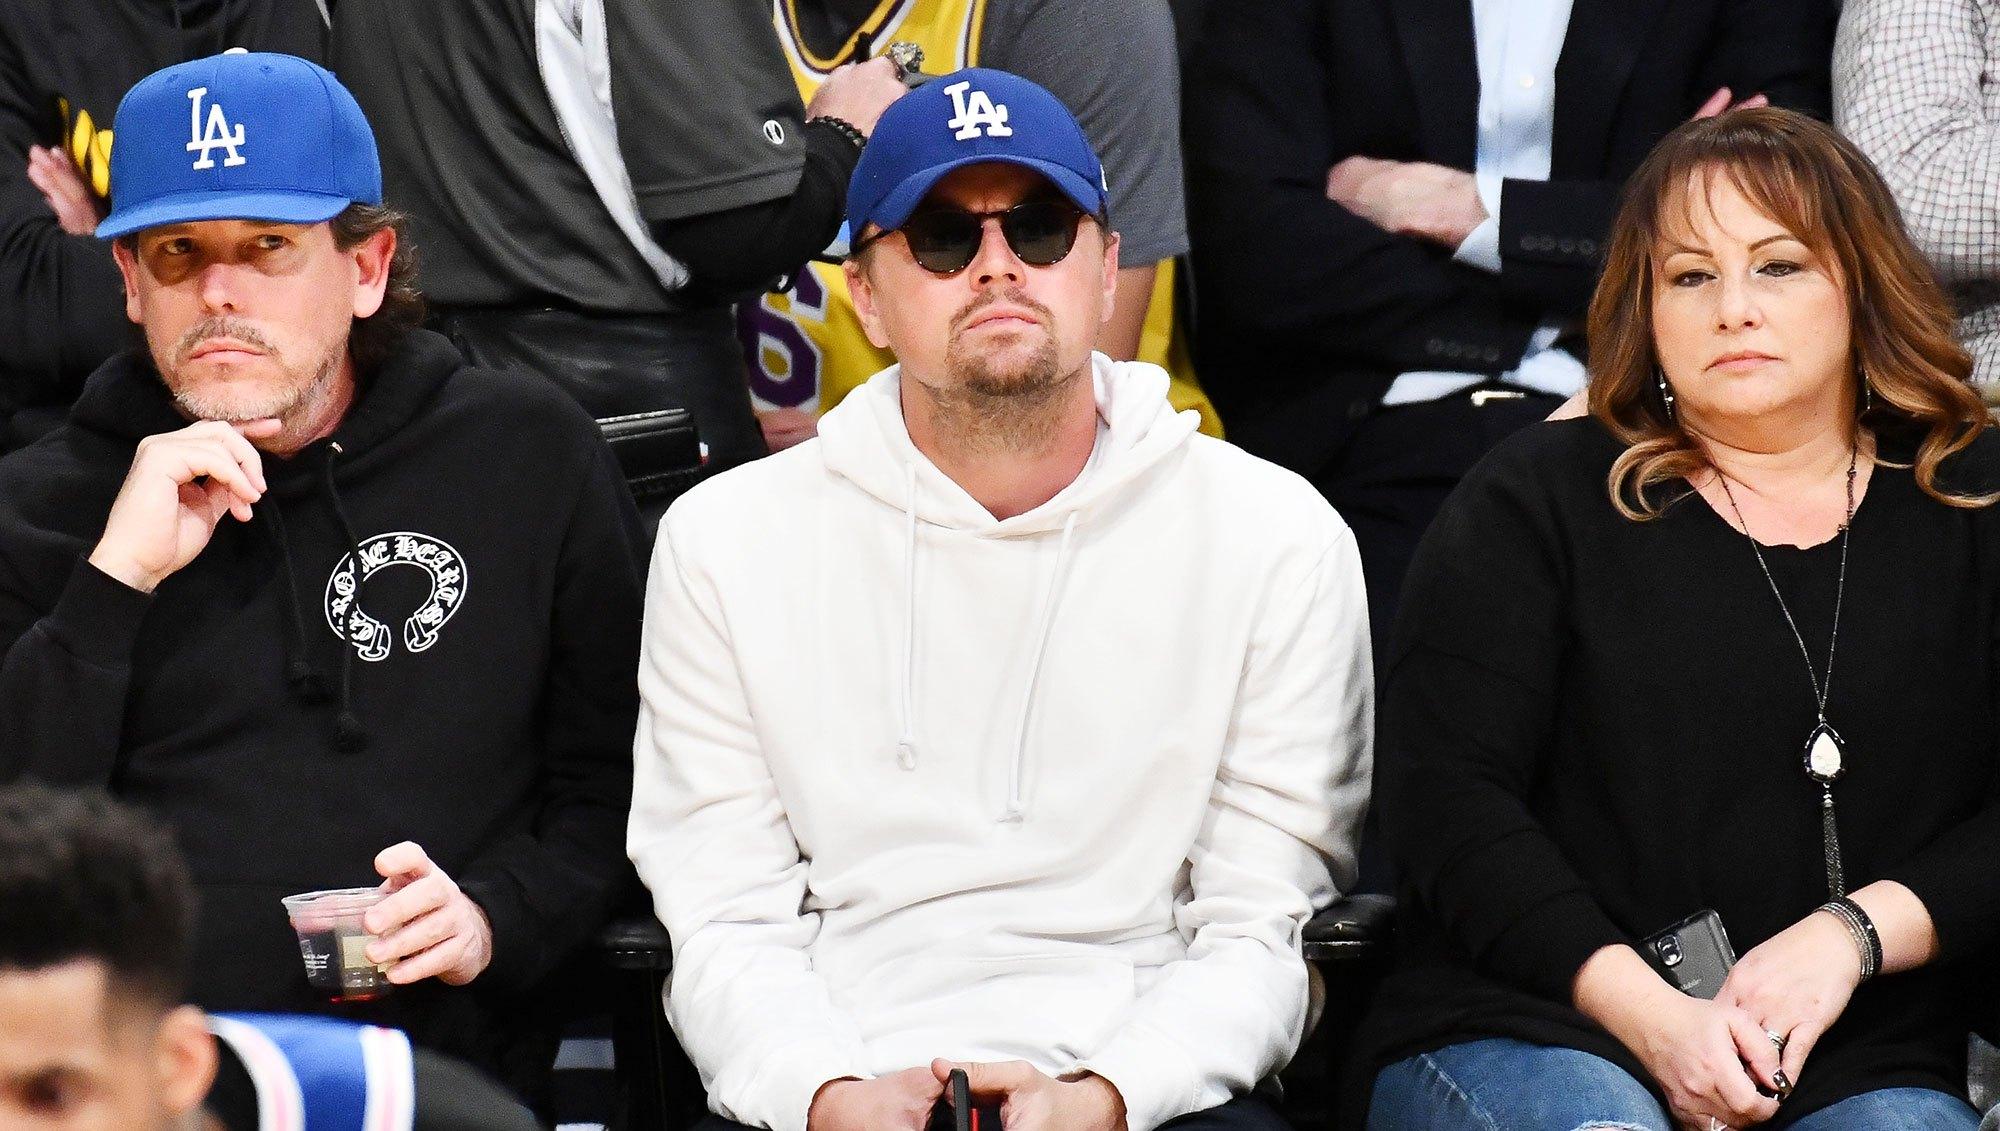 Leonardo DiCaprio Lakers Game Hiding In Plain Sight